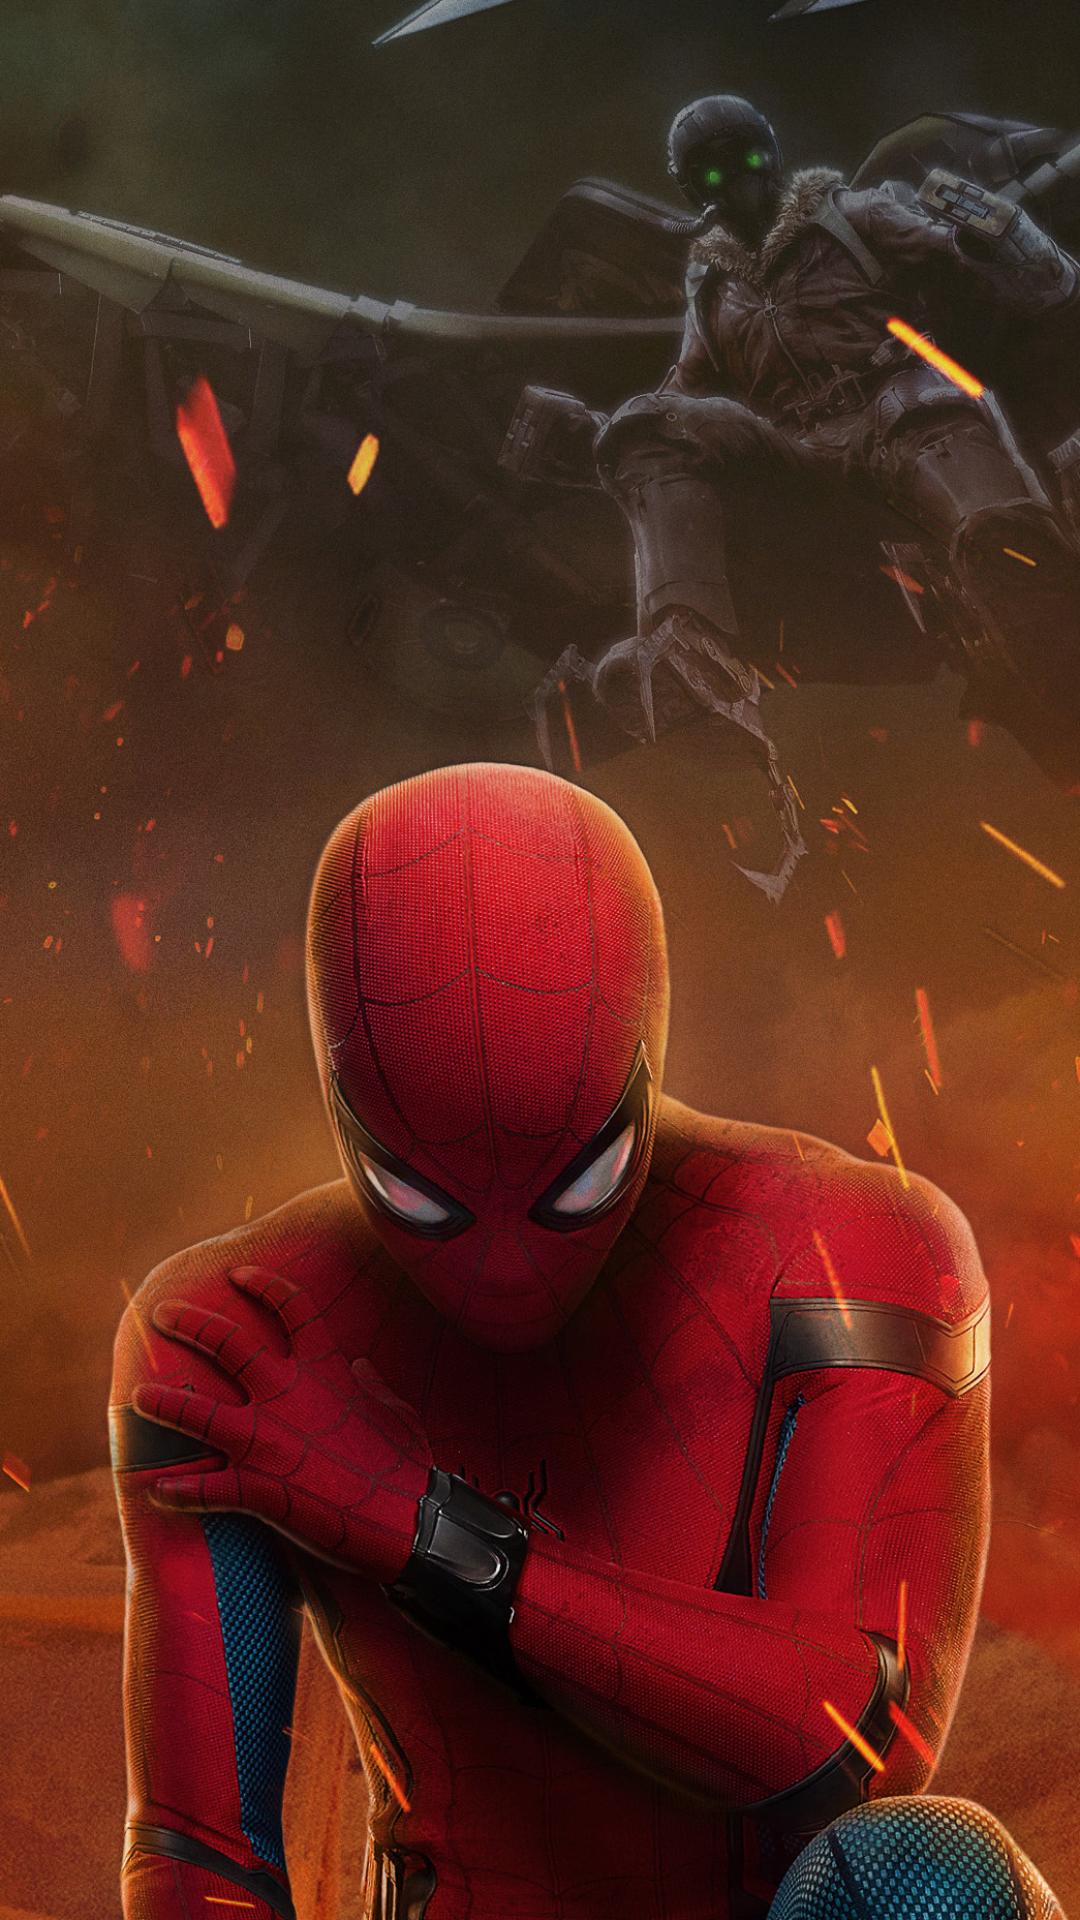 MovieSpider Man Homecoming 1080x1920 Wallpaper ID 694660 1080x1920